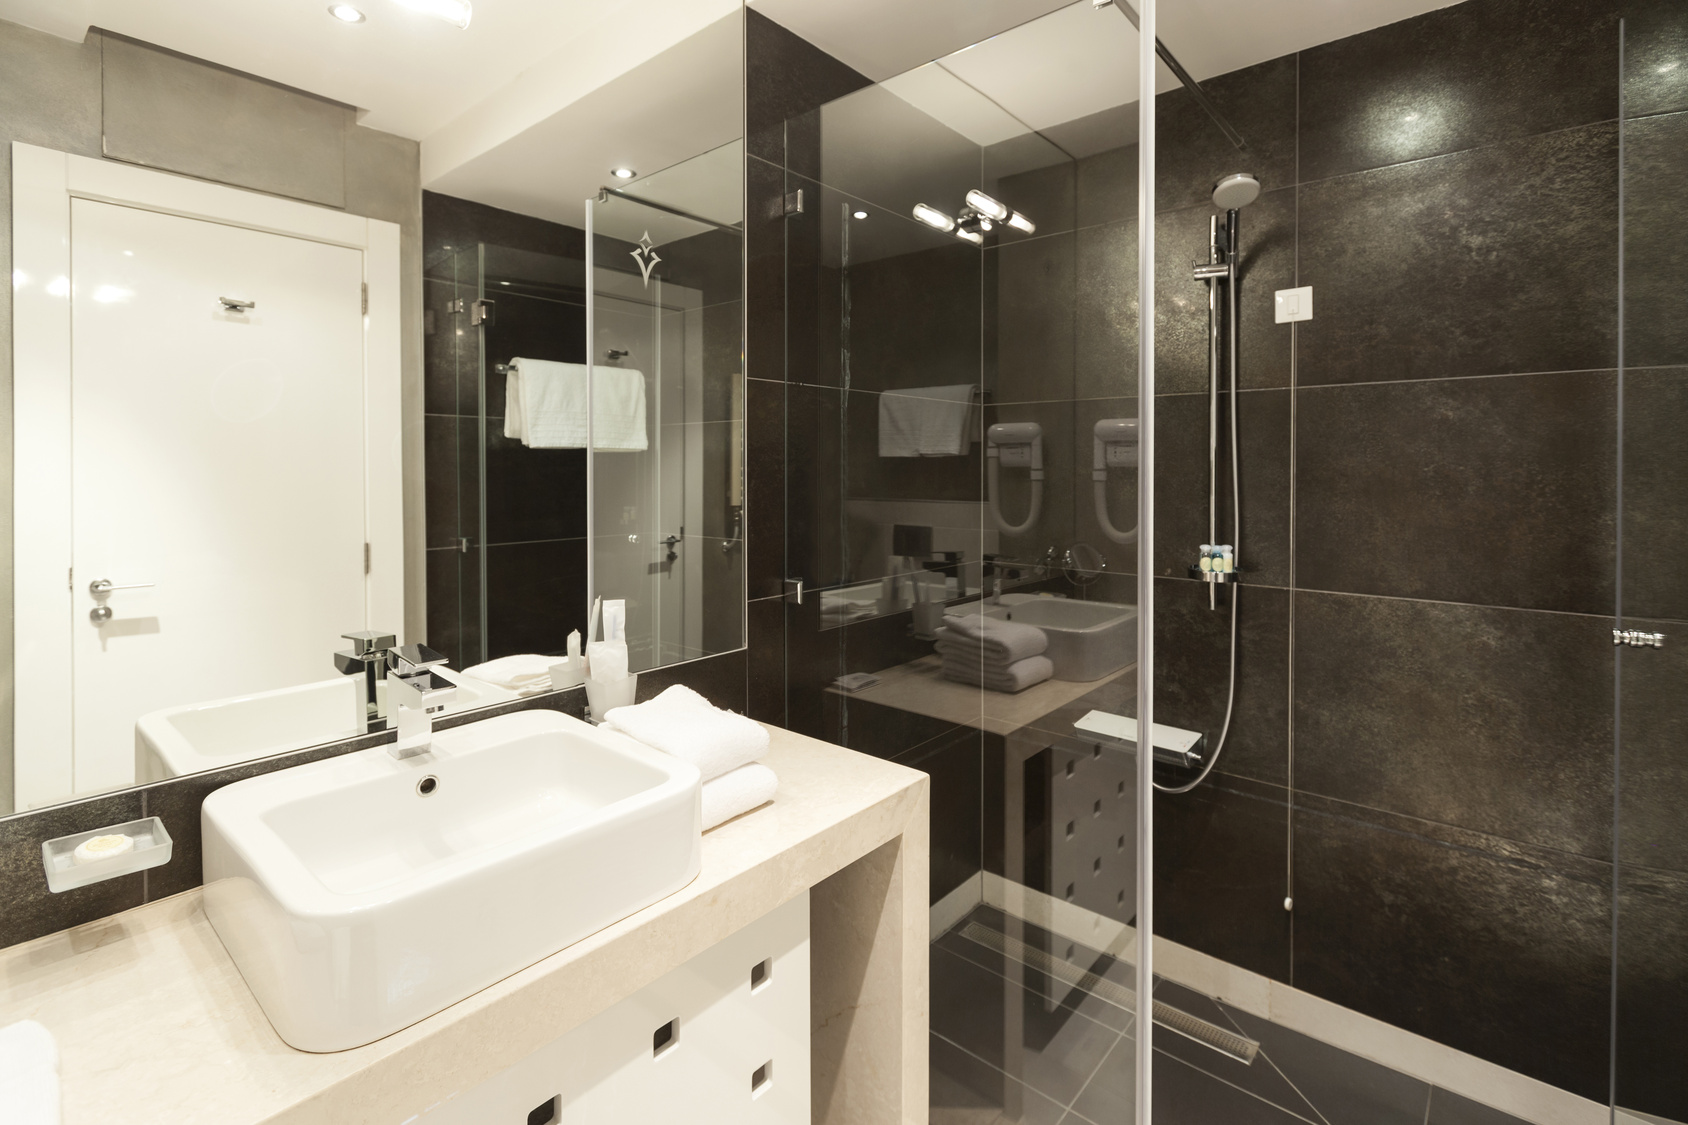 normes lectrique salle de bain - Normes Salle De Bain